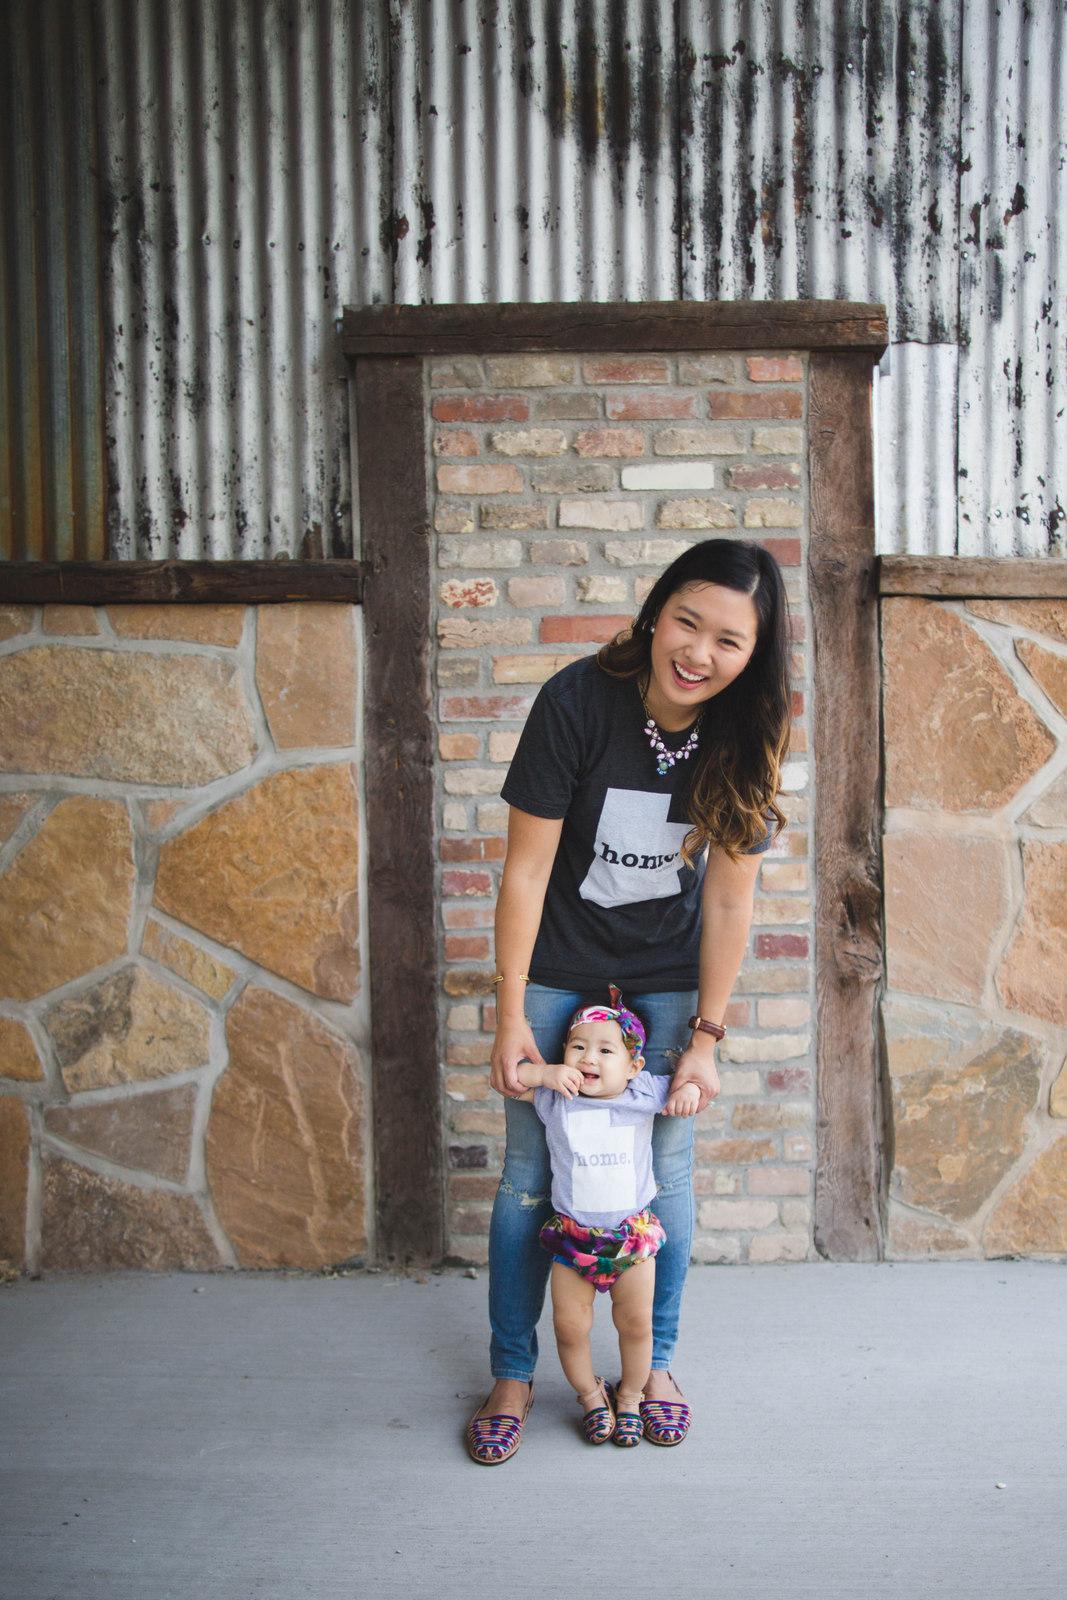 Mommy and me Utah home tees